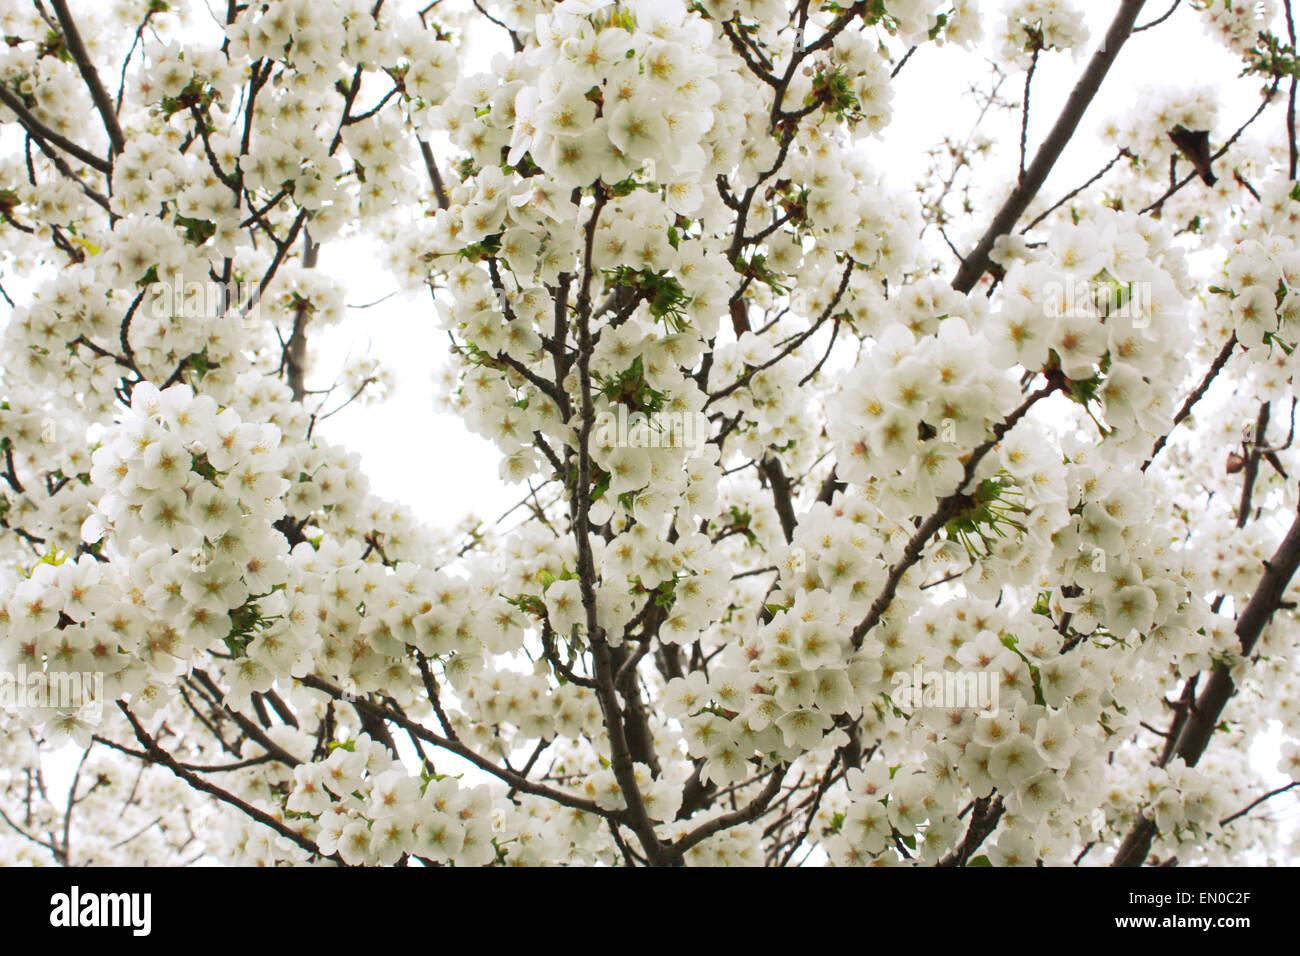 White cherry blossom flowers in spring season Stock Photo